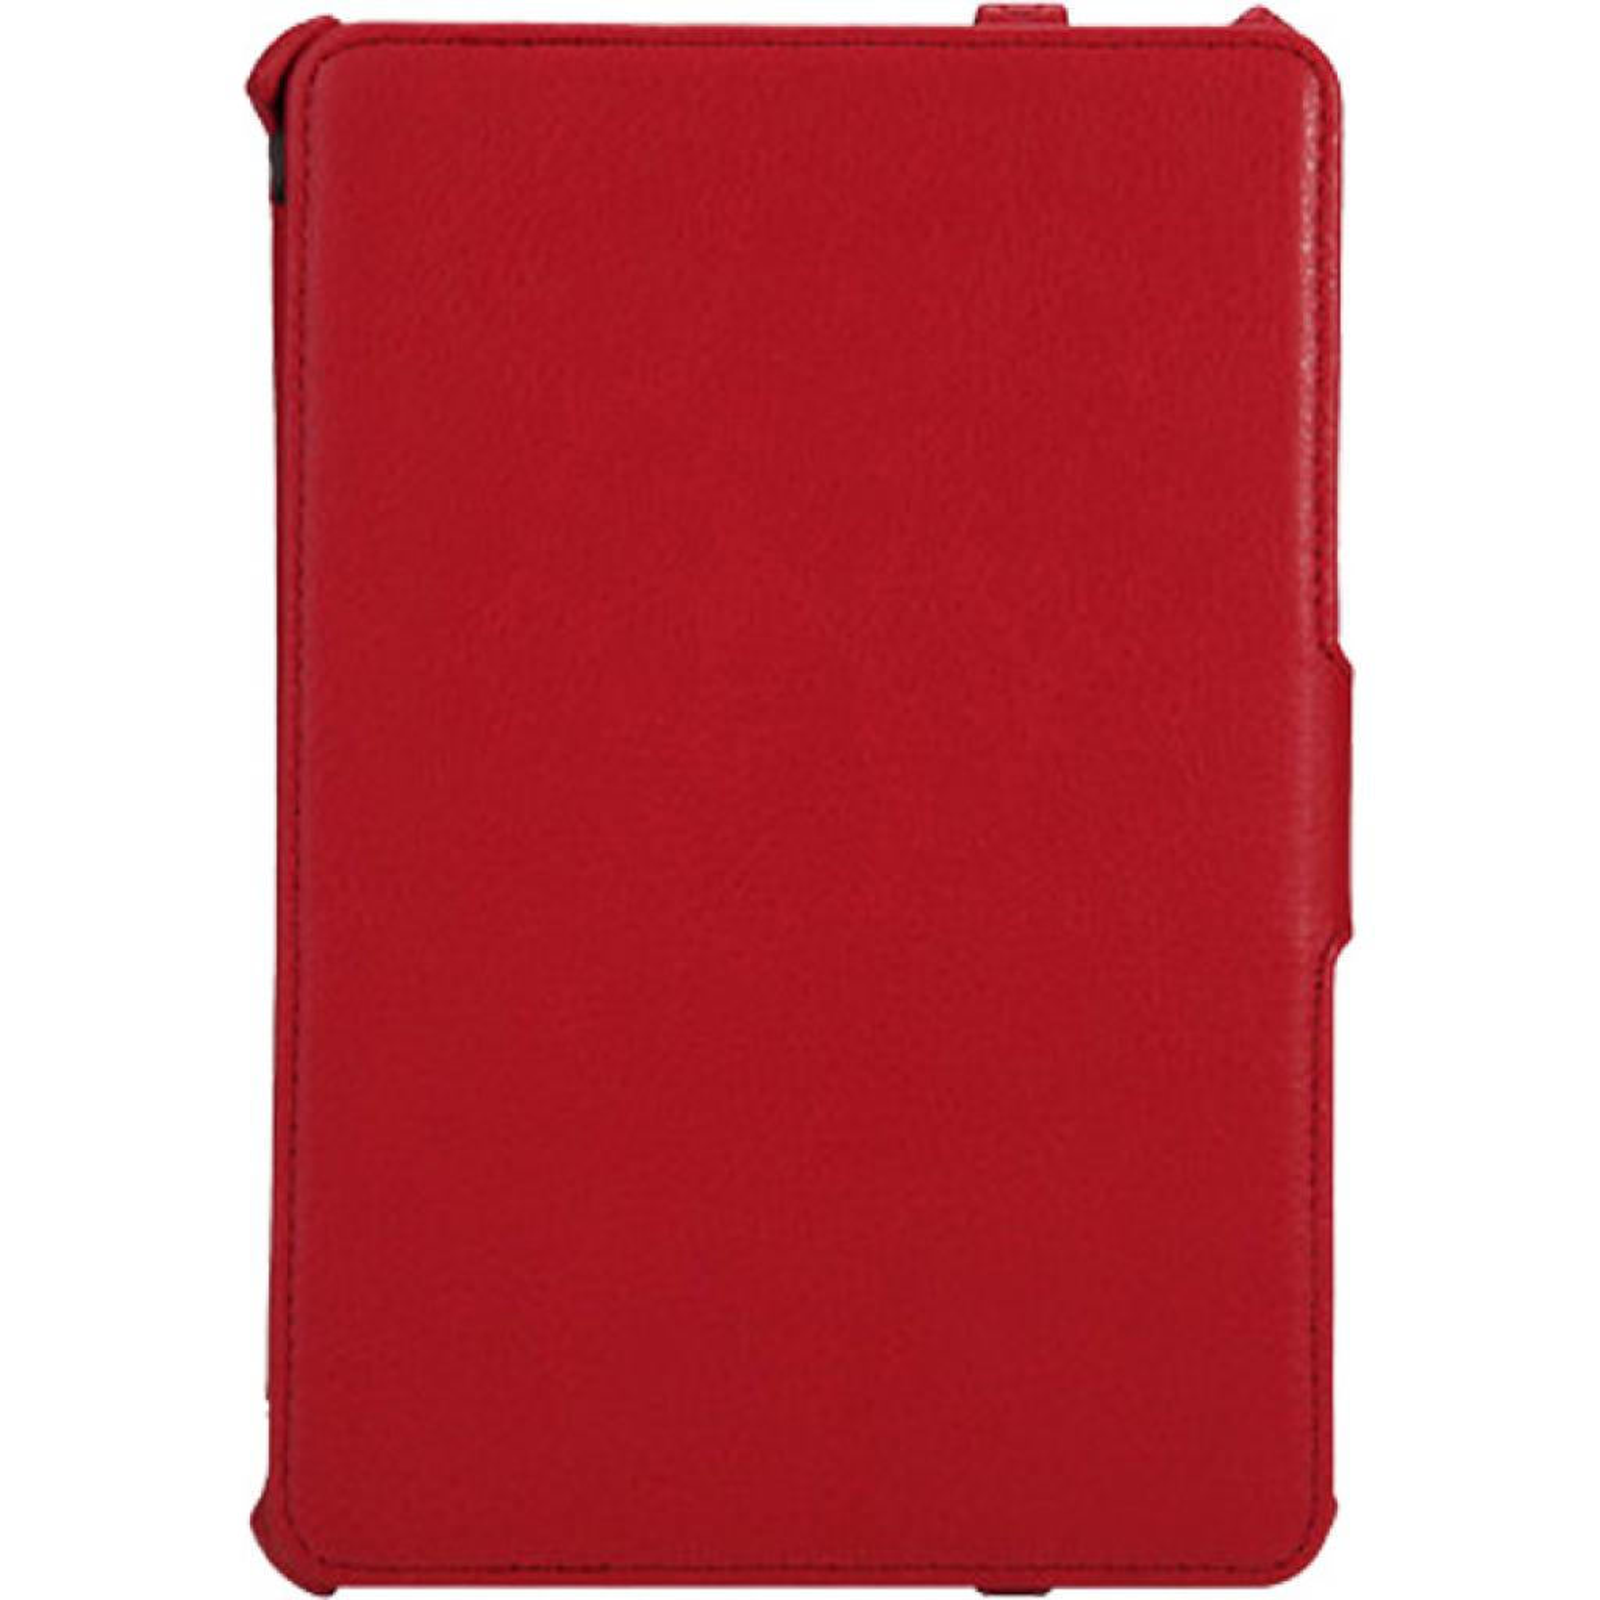 Чехол для планшета AirOn для Samsung Galaxy Tab S 2 8.0 red (4822352777524)